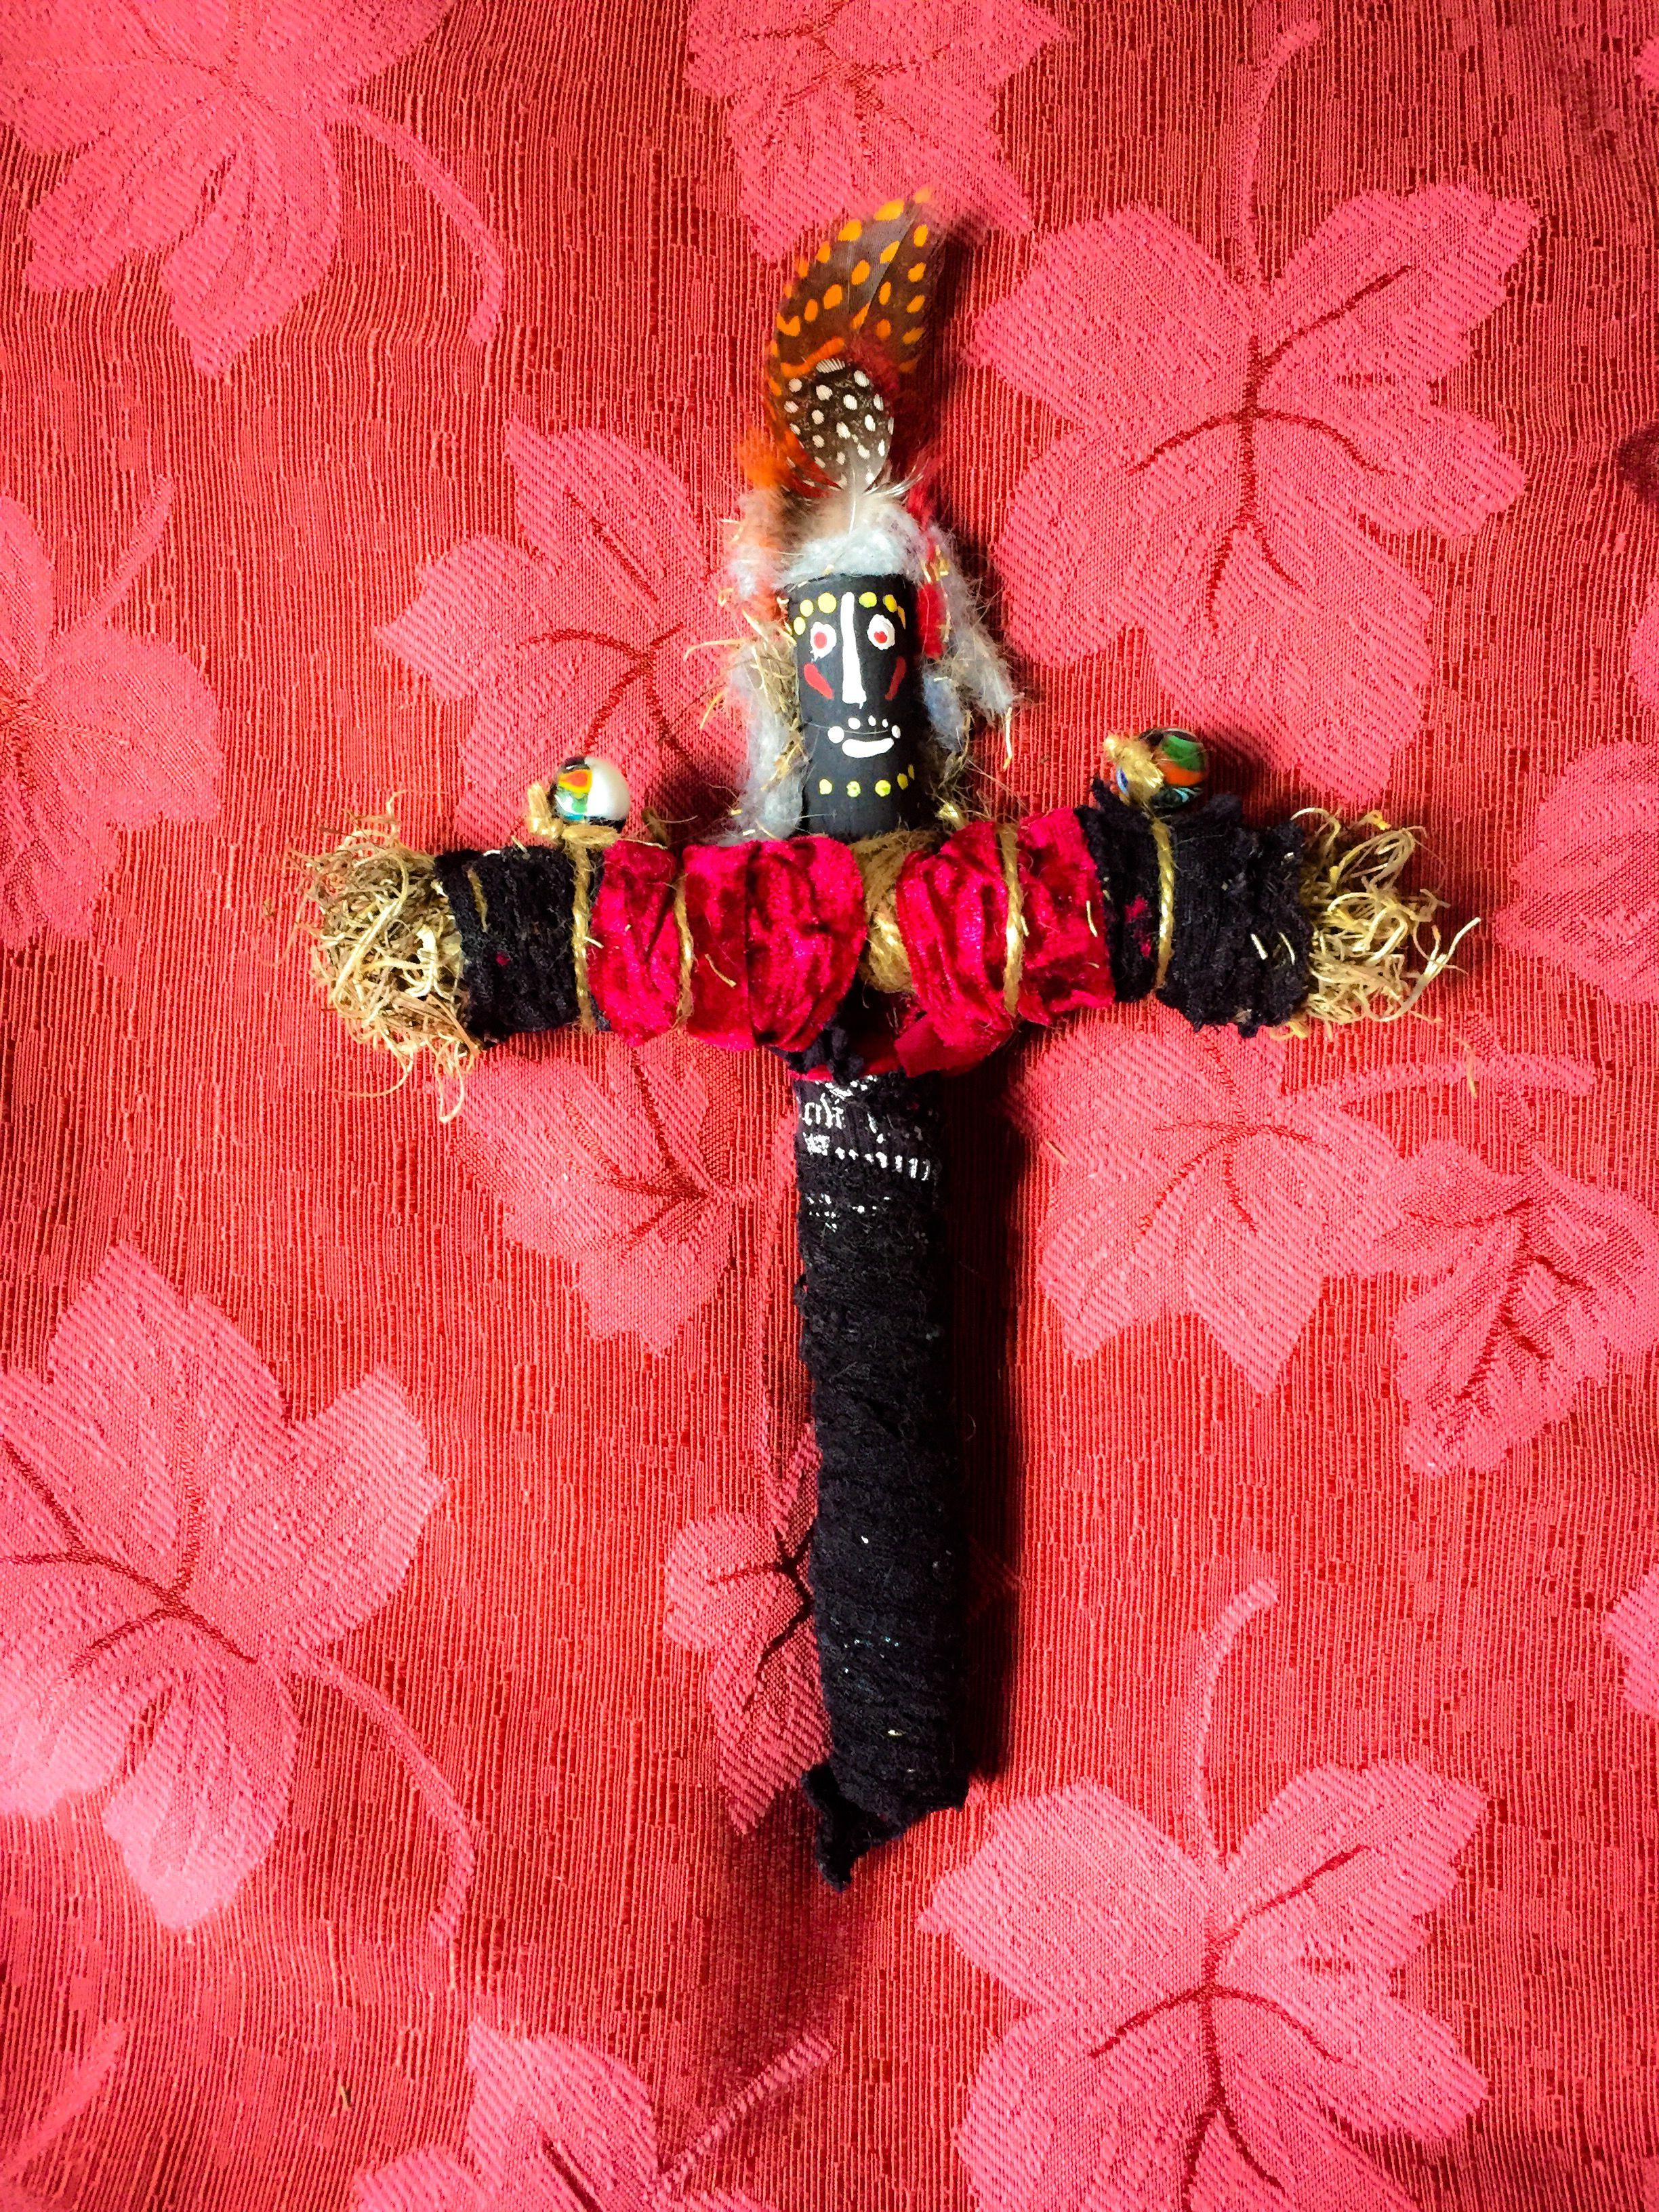 authentic voodoo doll | Voodoo dolls, Voodoo, Dolls